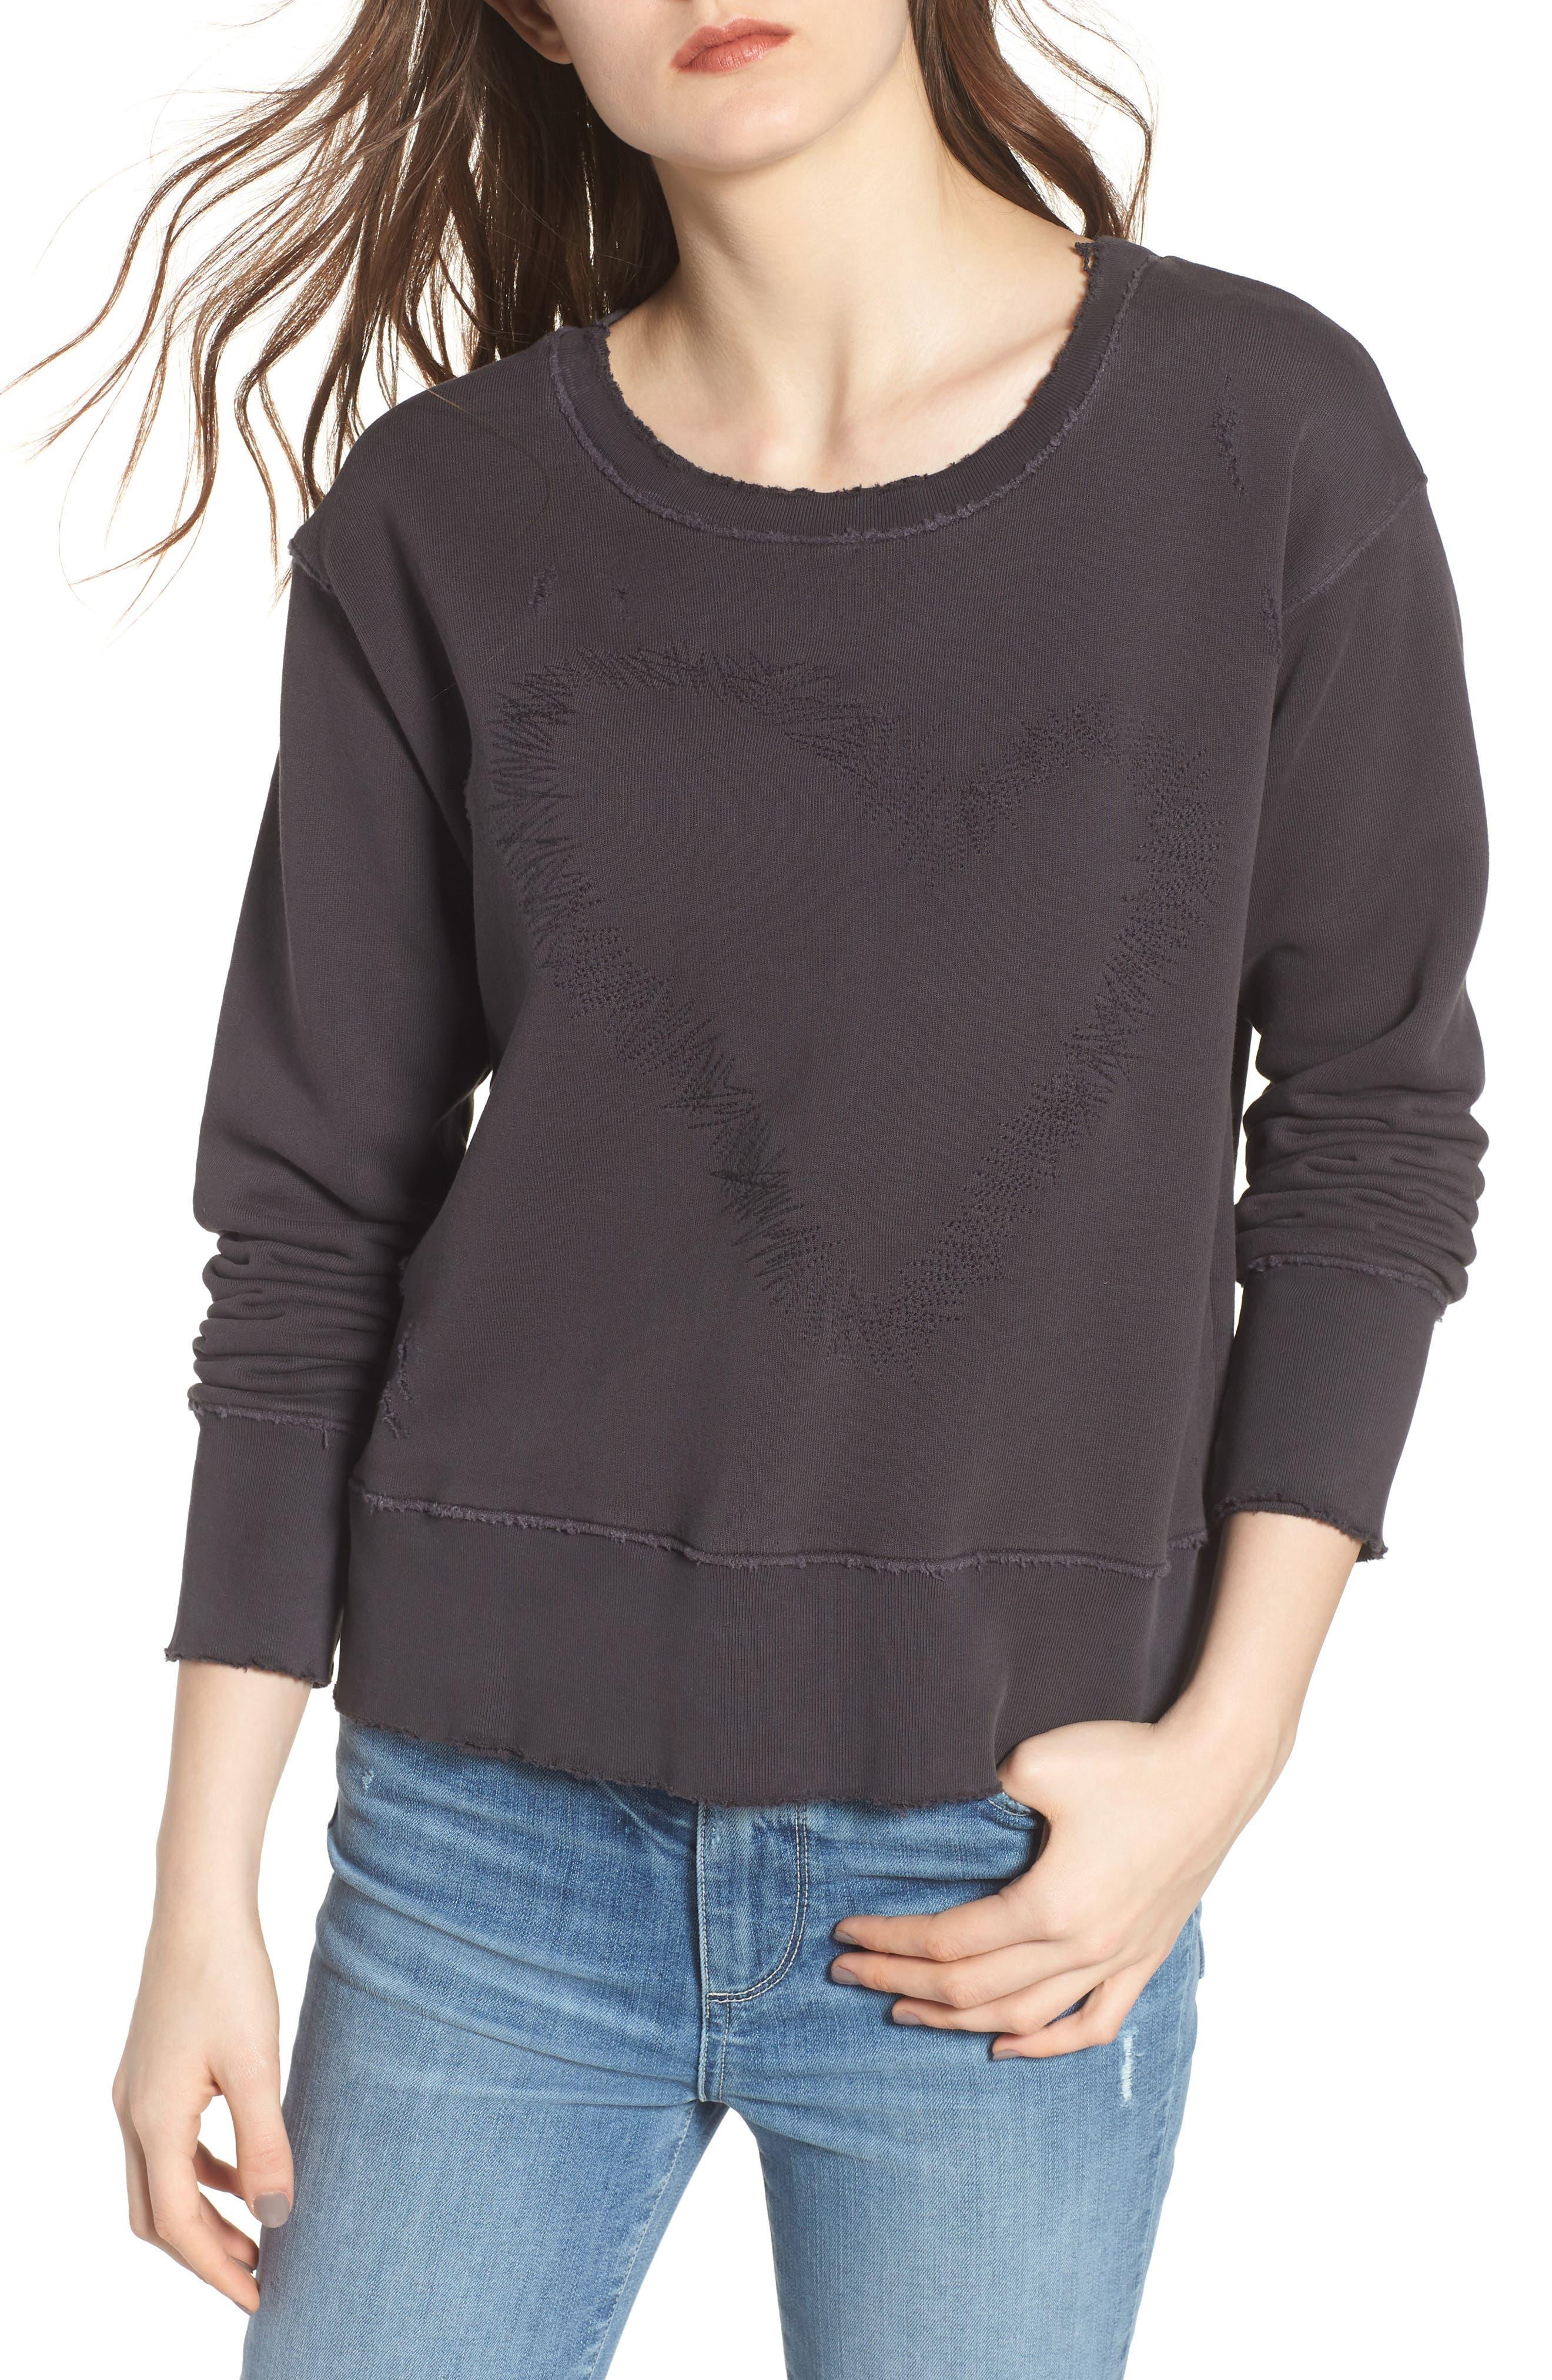 Frank & Eileen Tee Lab Heart Embroidered Sweatshirt